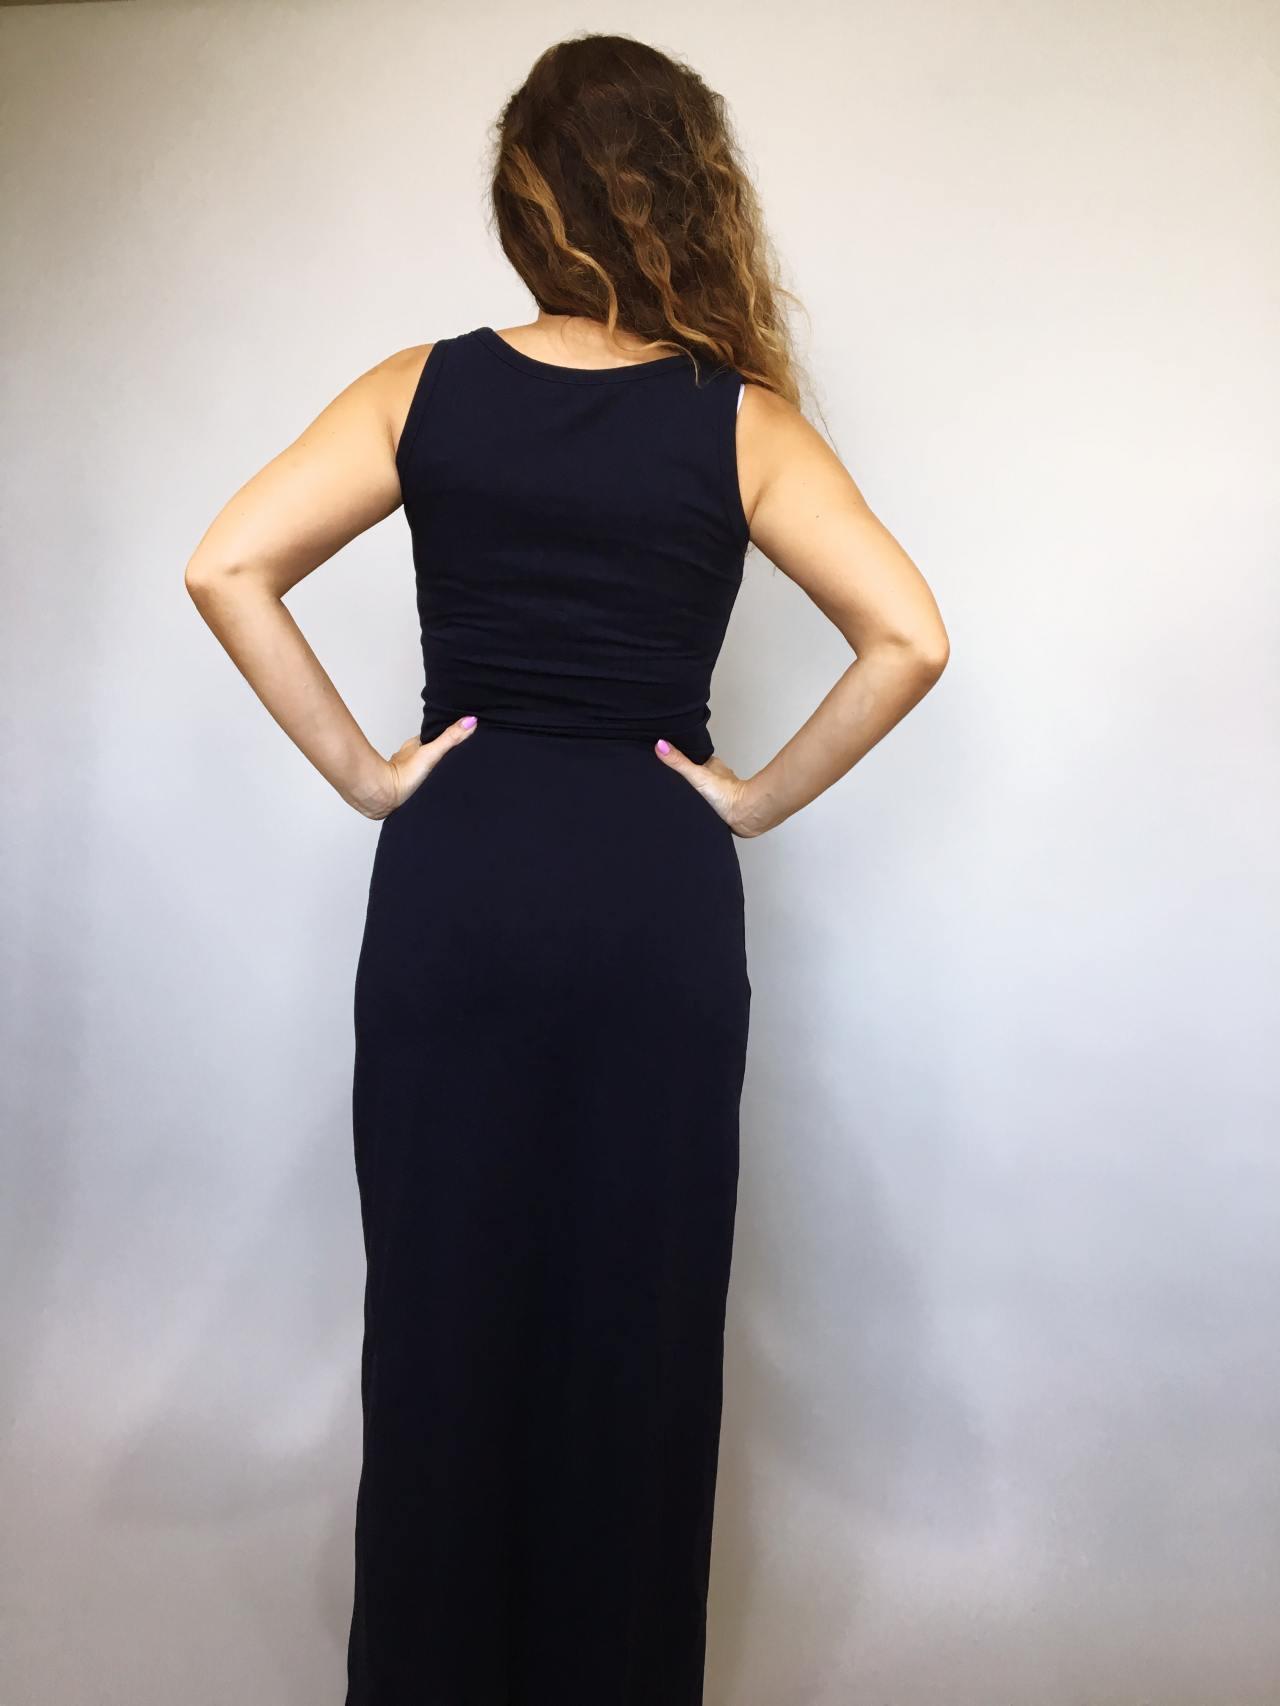 Šaty Goldie tmavě modré 04